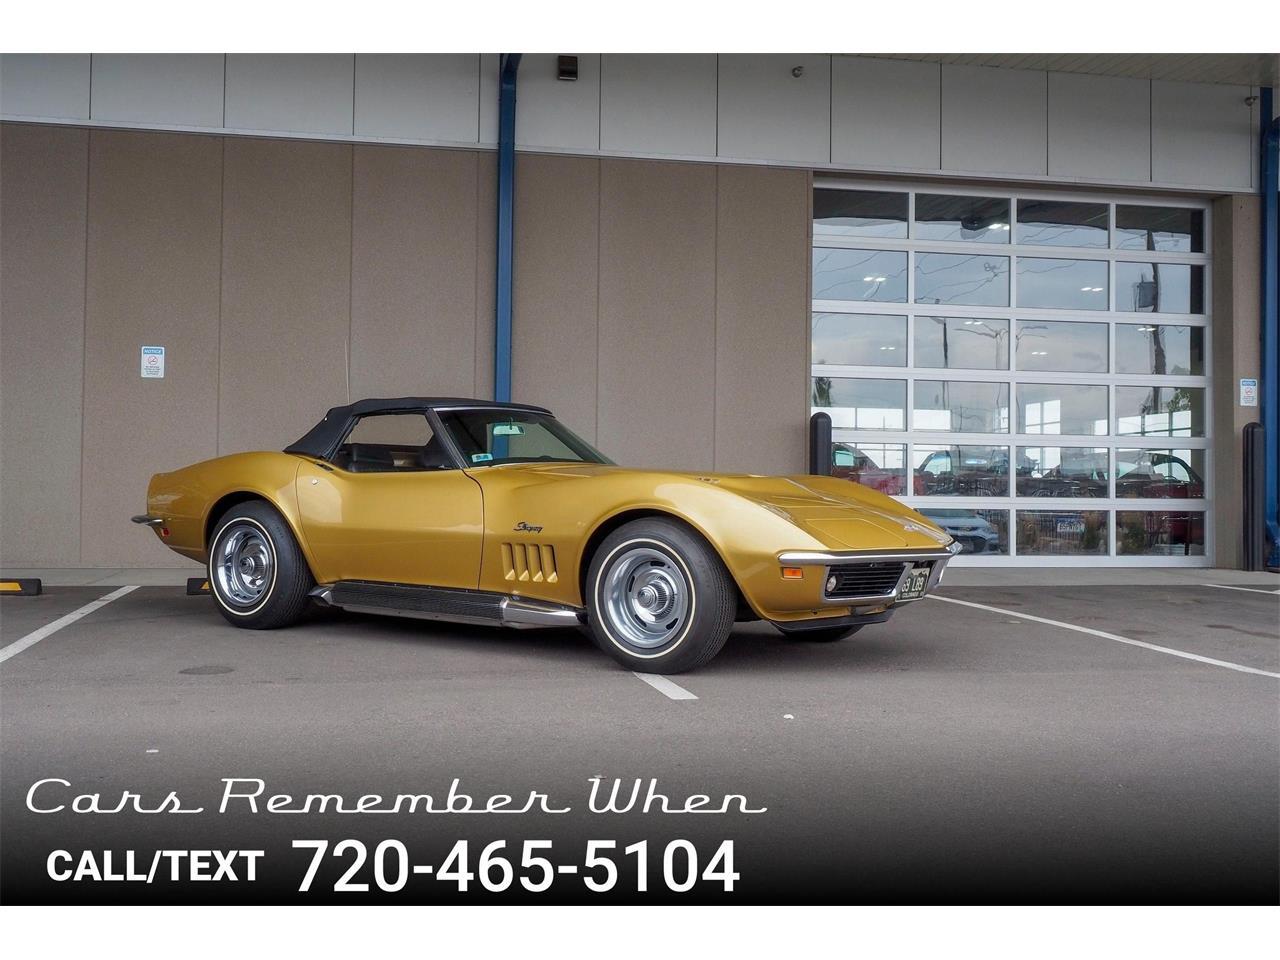 For Sale: 1969 Chevrolet Corvette in Englewood, Colorado